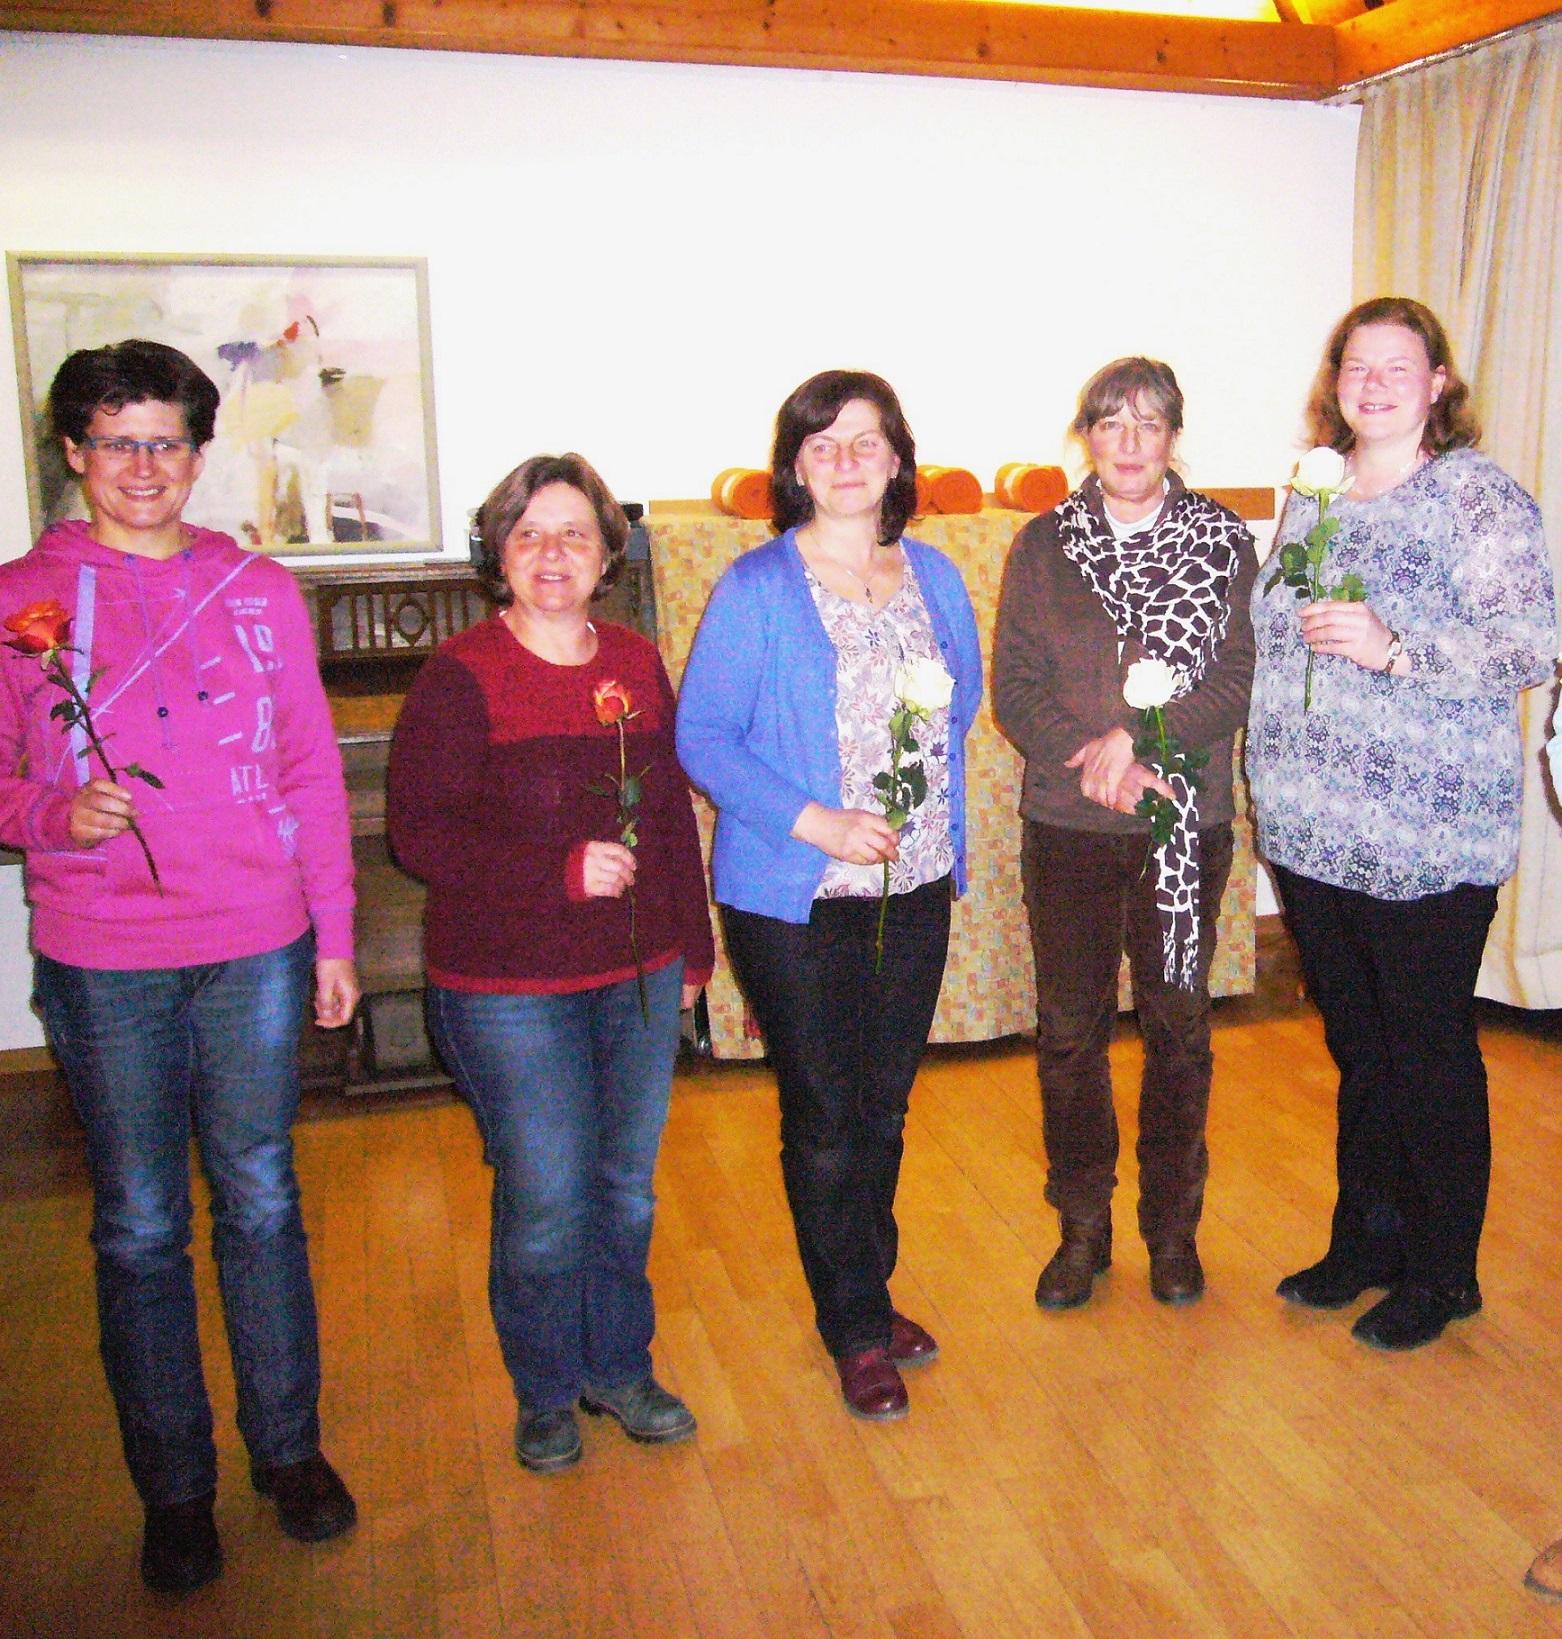 Die Damen des Vorstands v.l.n.r.: Claudia Krüger, Maria Diem, Lissi Widmann, Marianne Vögele, Irmi Baumgartner